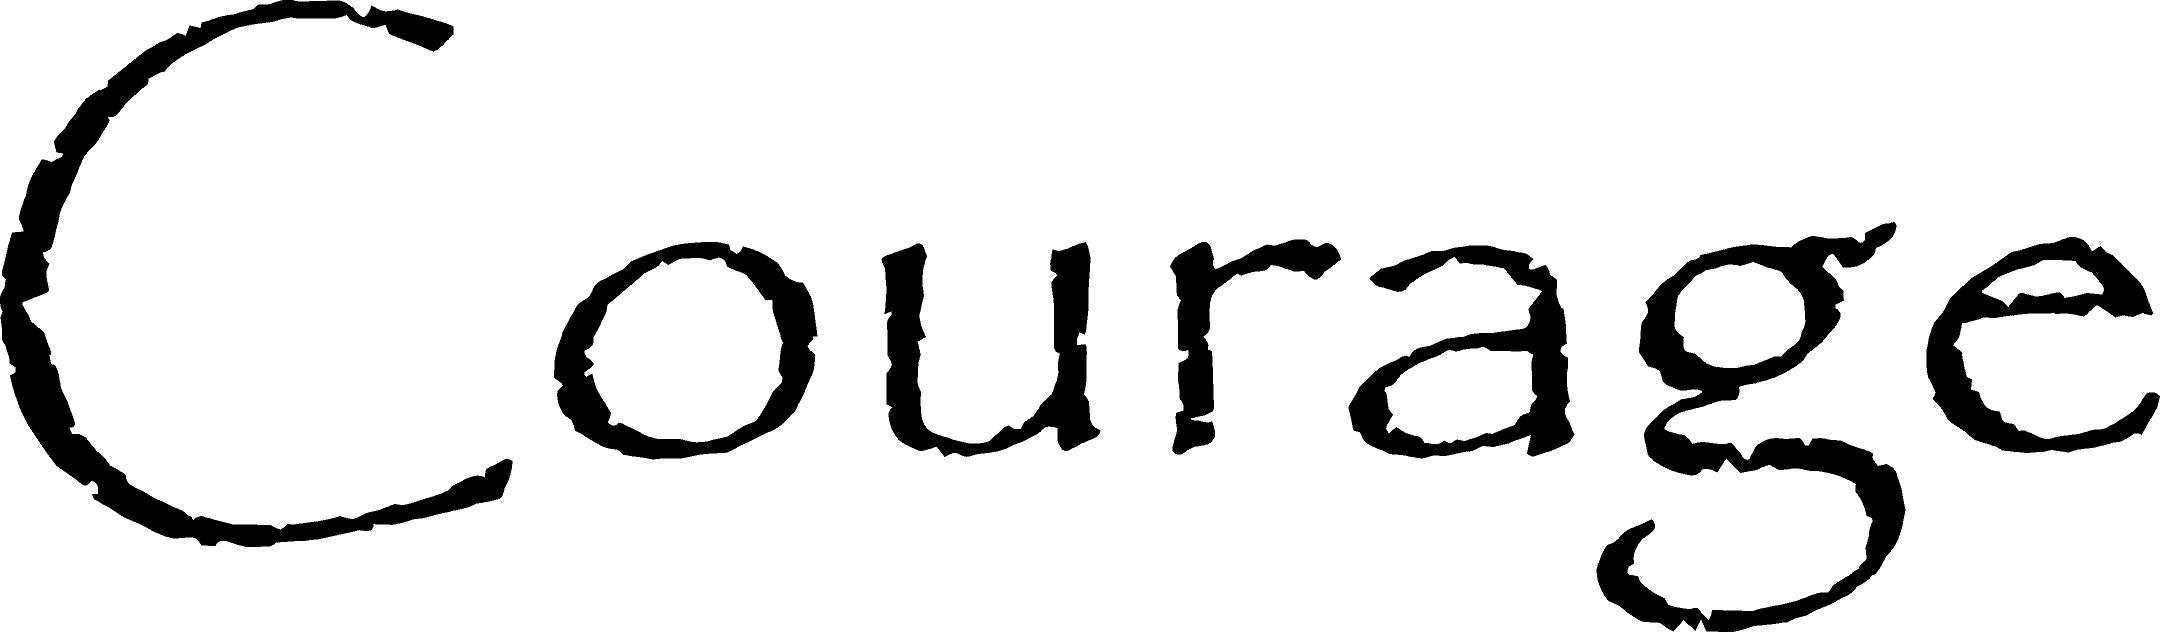 chiune sugihara by gabrielle henriques infographic ldquoholocaust essays the heroism of chiune sugihara rdquo the holocaust history a people s and survivor history remember org remember org 25 apr 1995